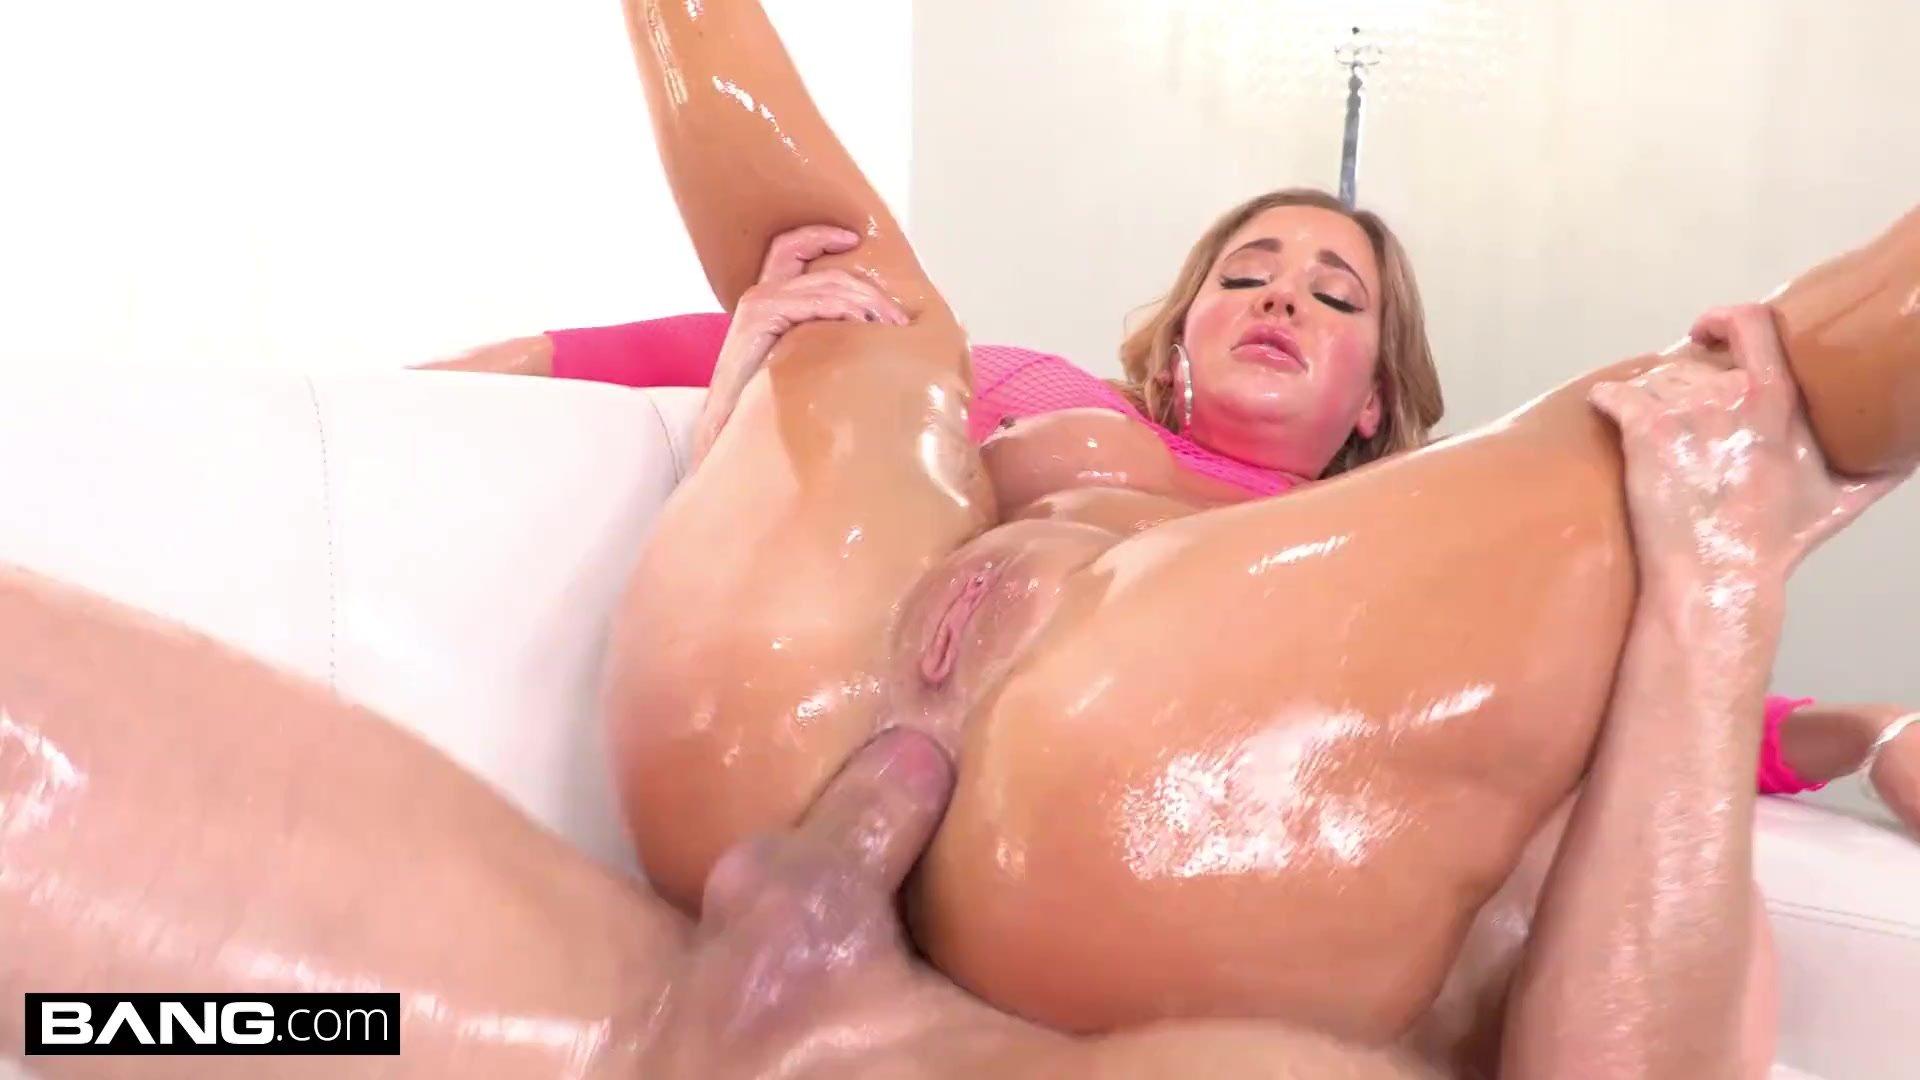 BANG Surprise - Savannah Bond Gets Her Big Ass Fucked Anal